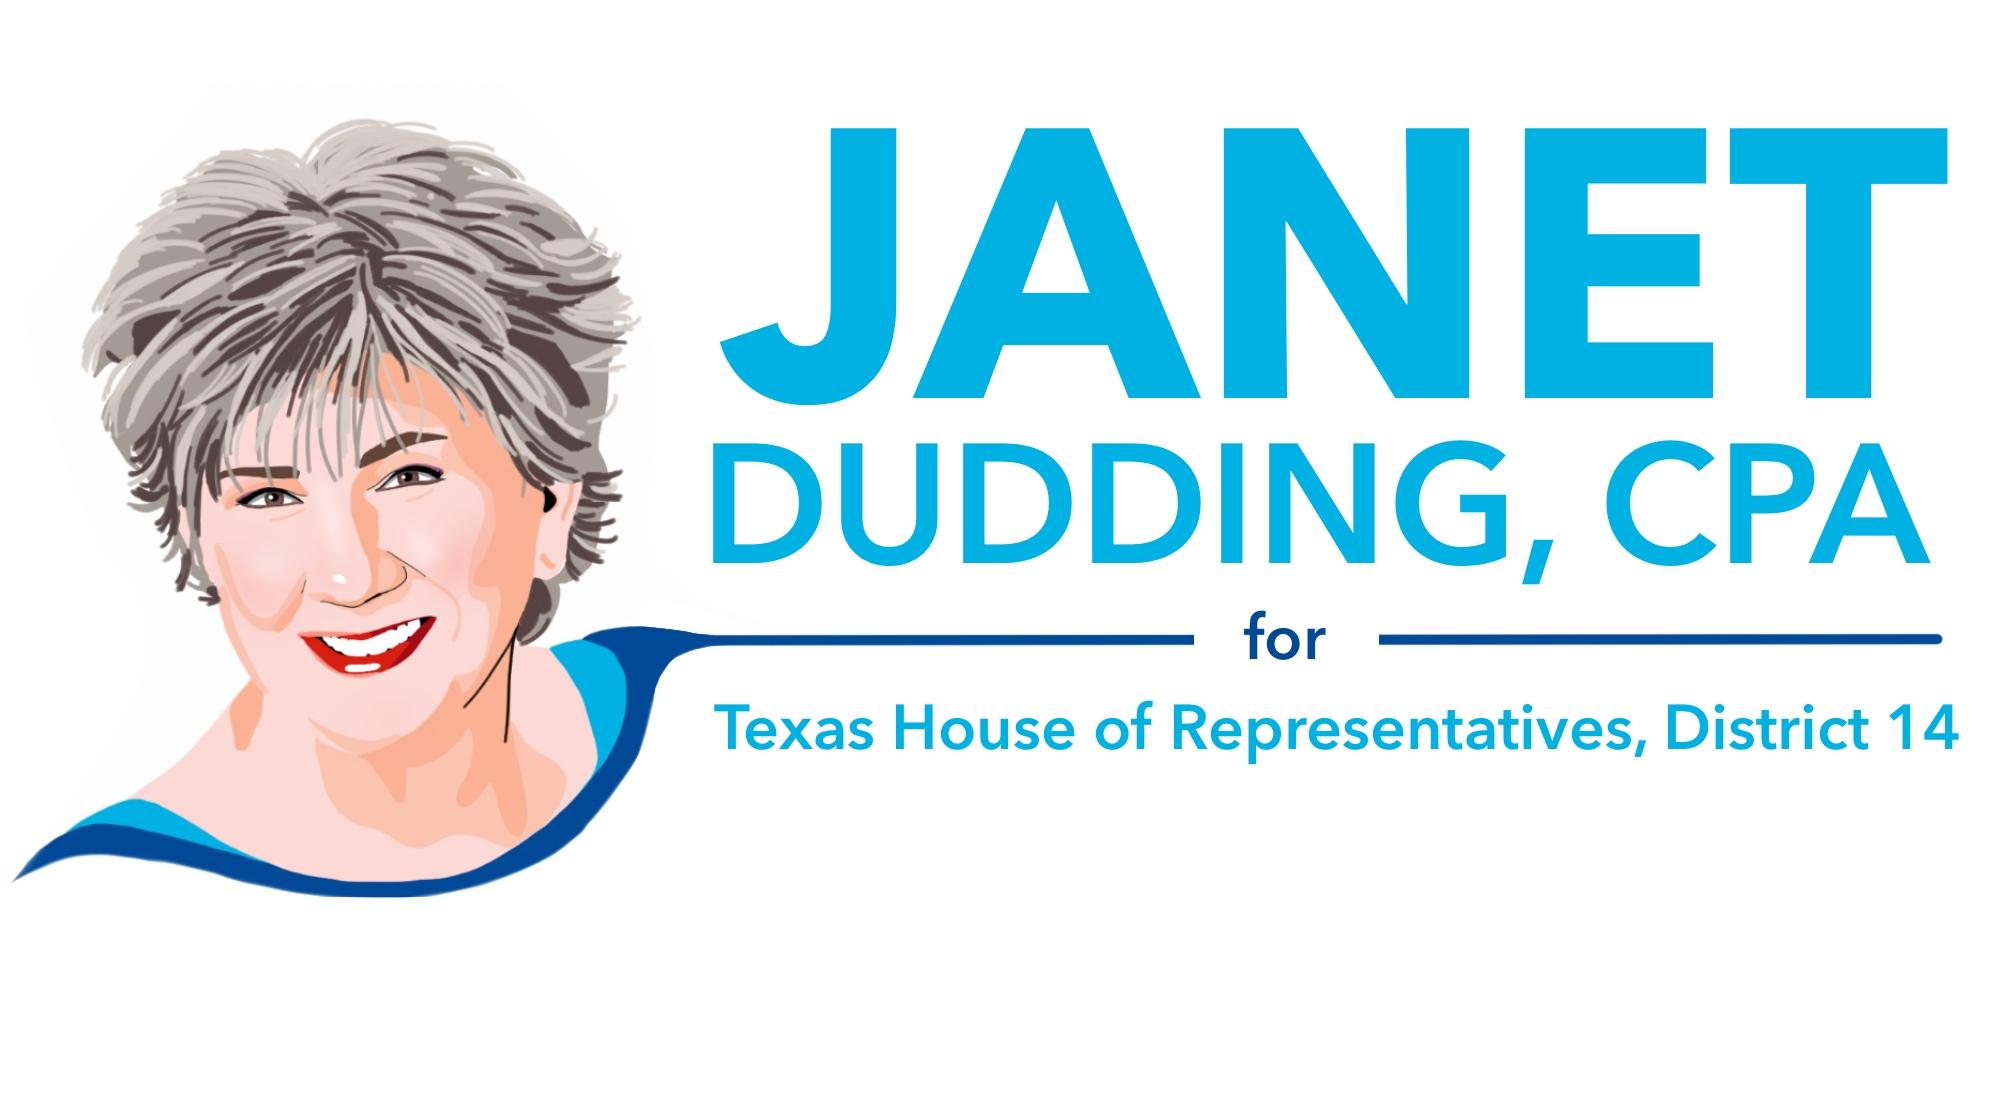 Janet T Dudding